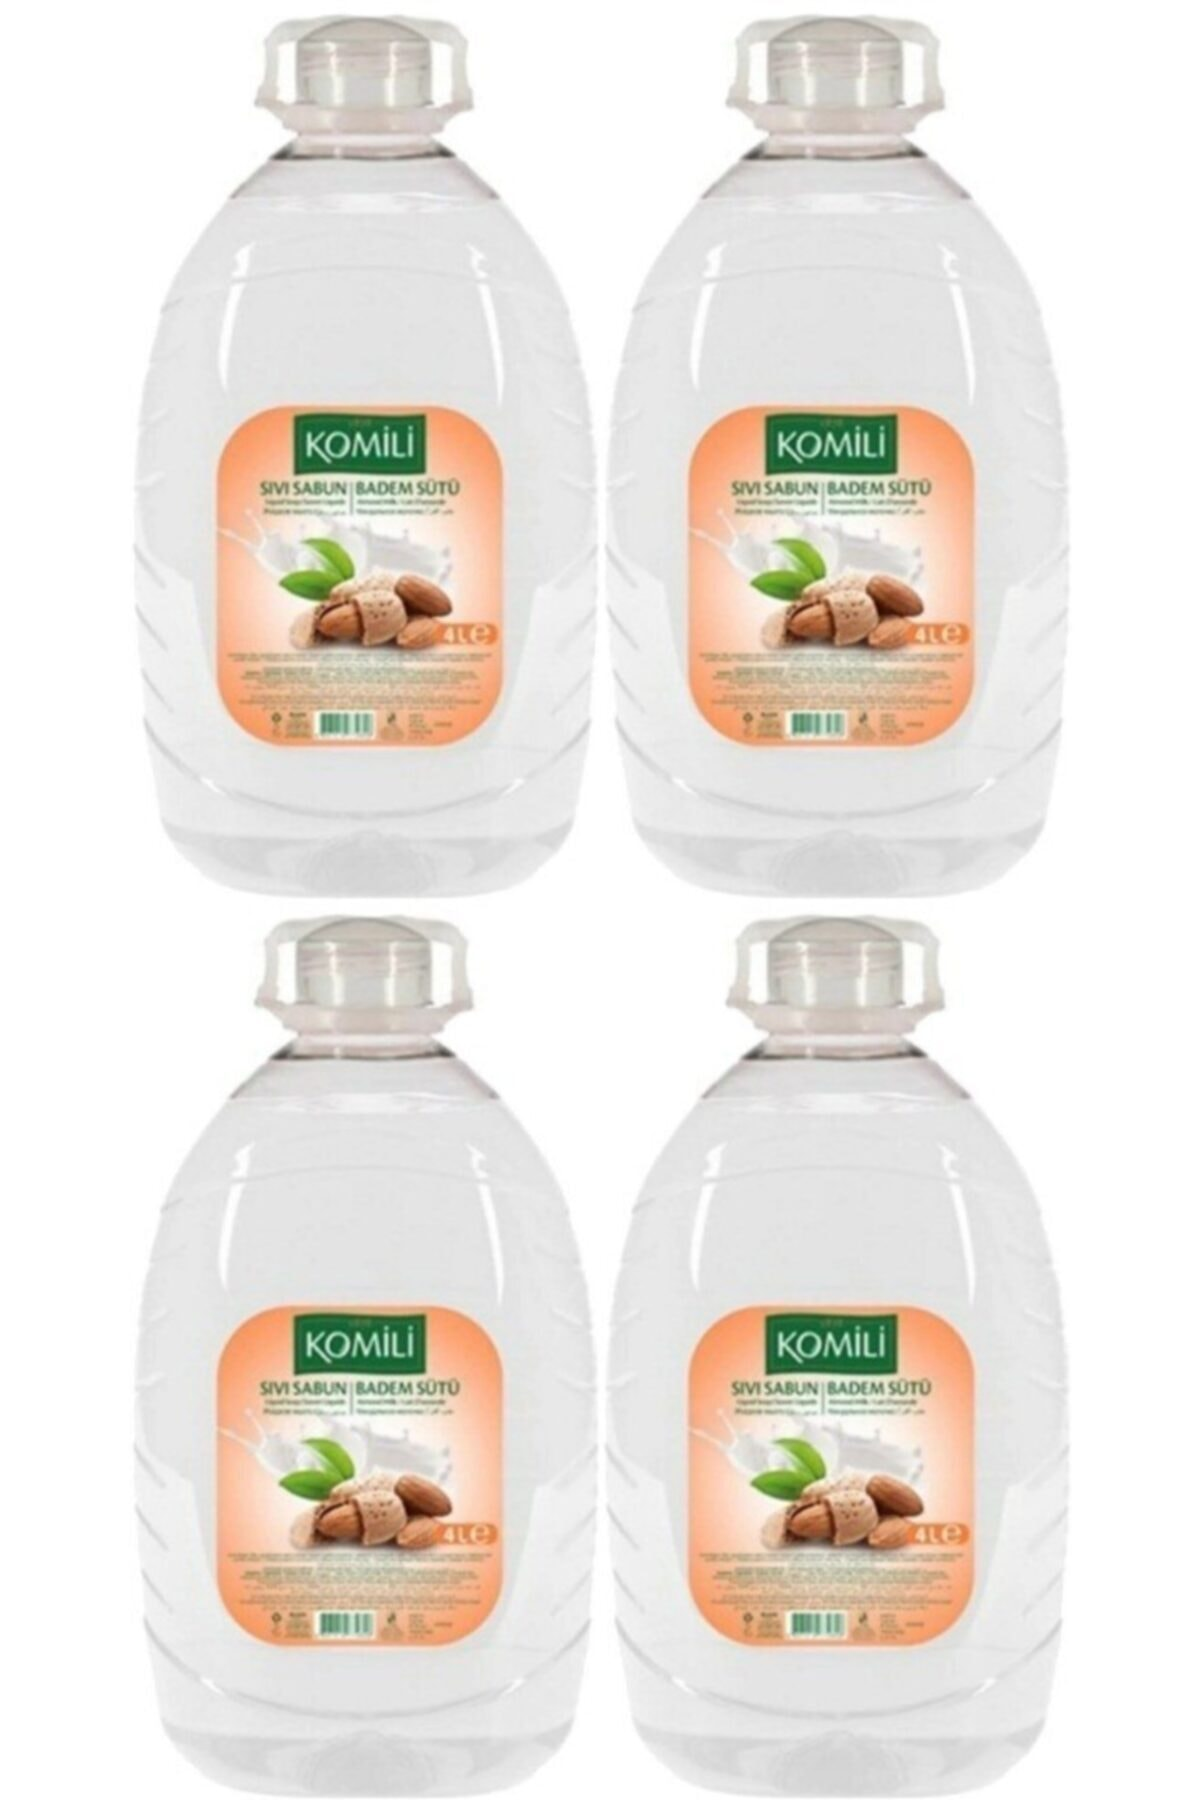 Komili Sıvı El Sabun Badem Sütü 4 Adet X 4 Lt